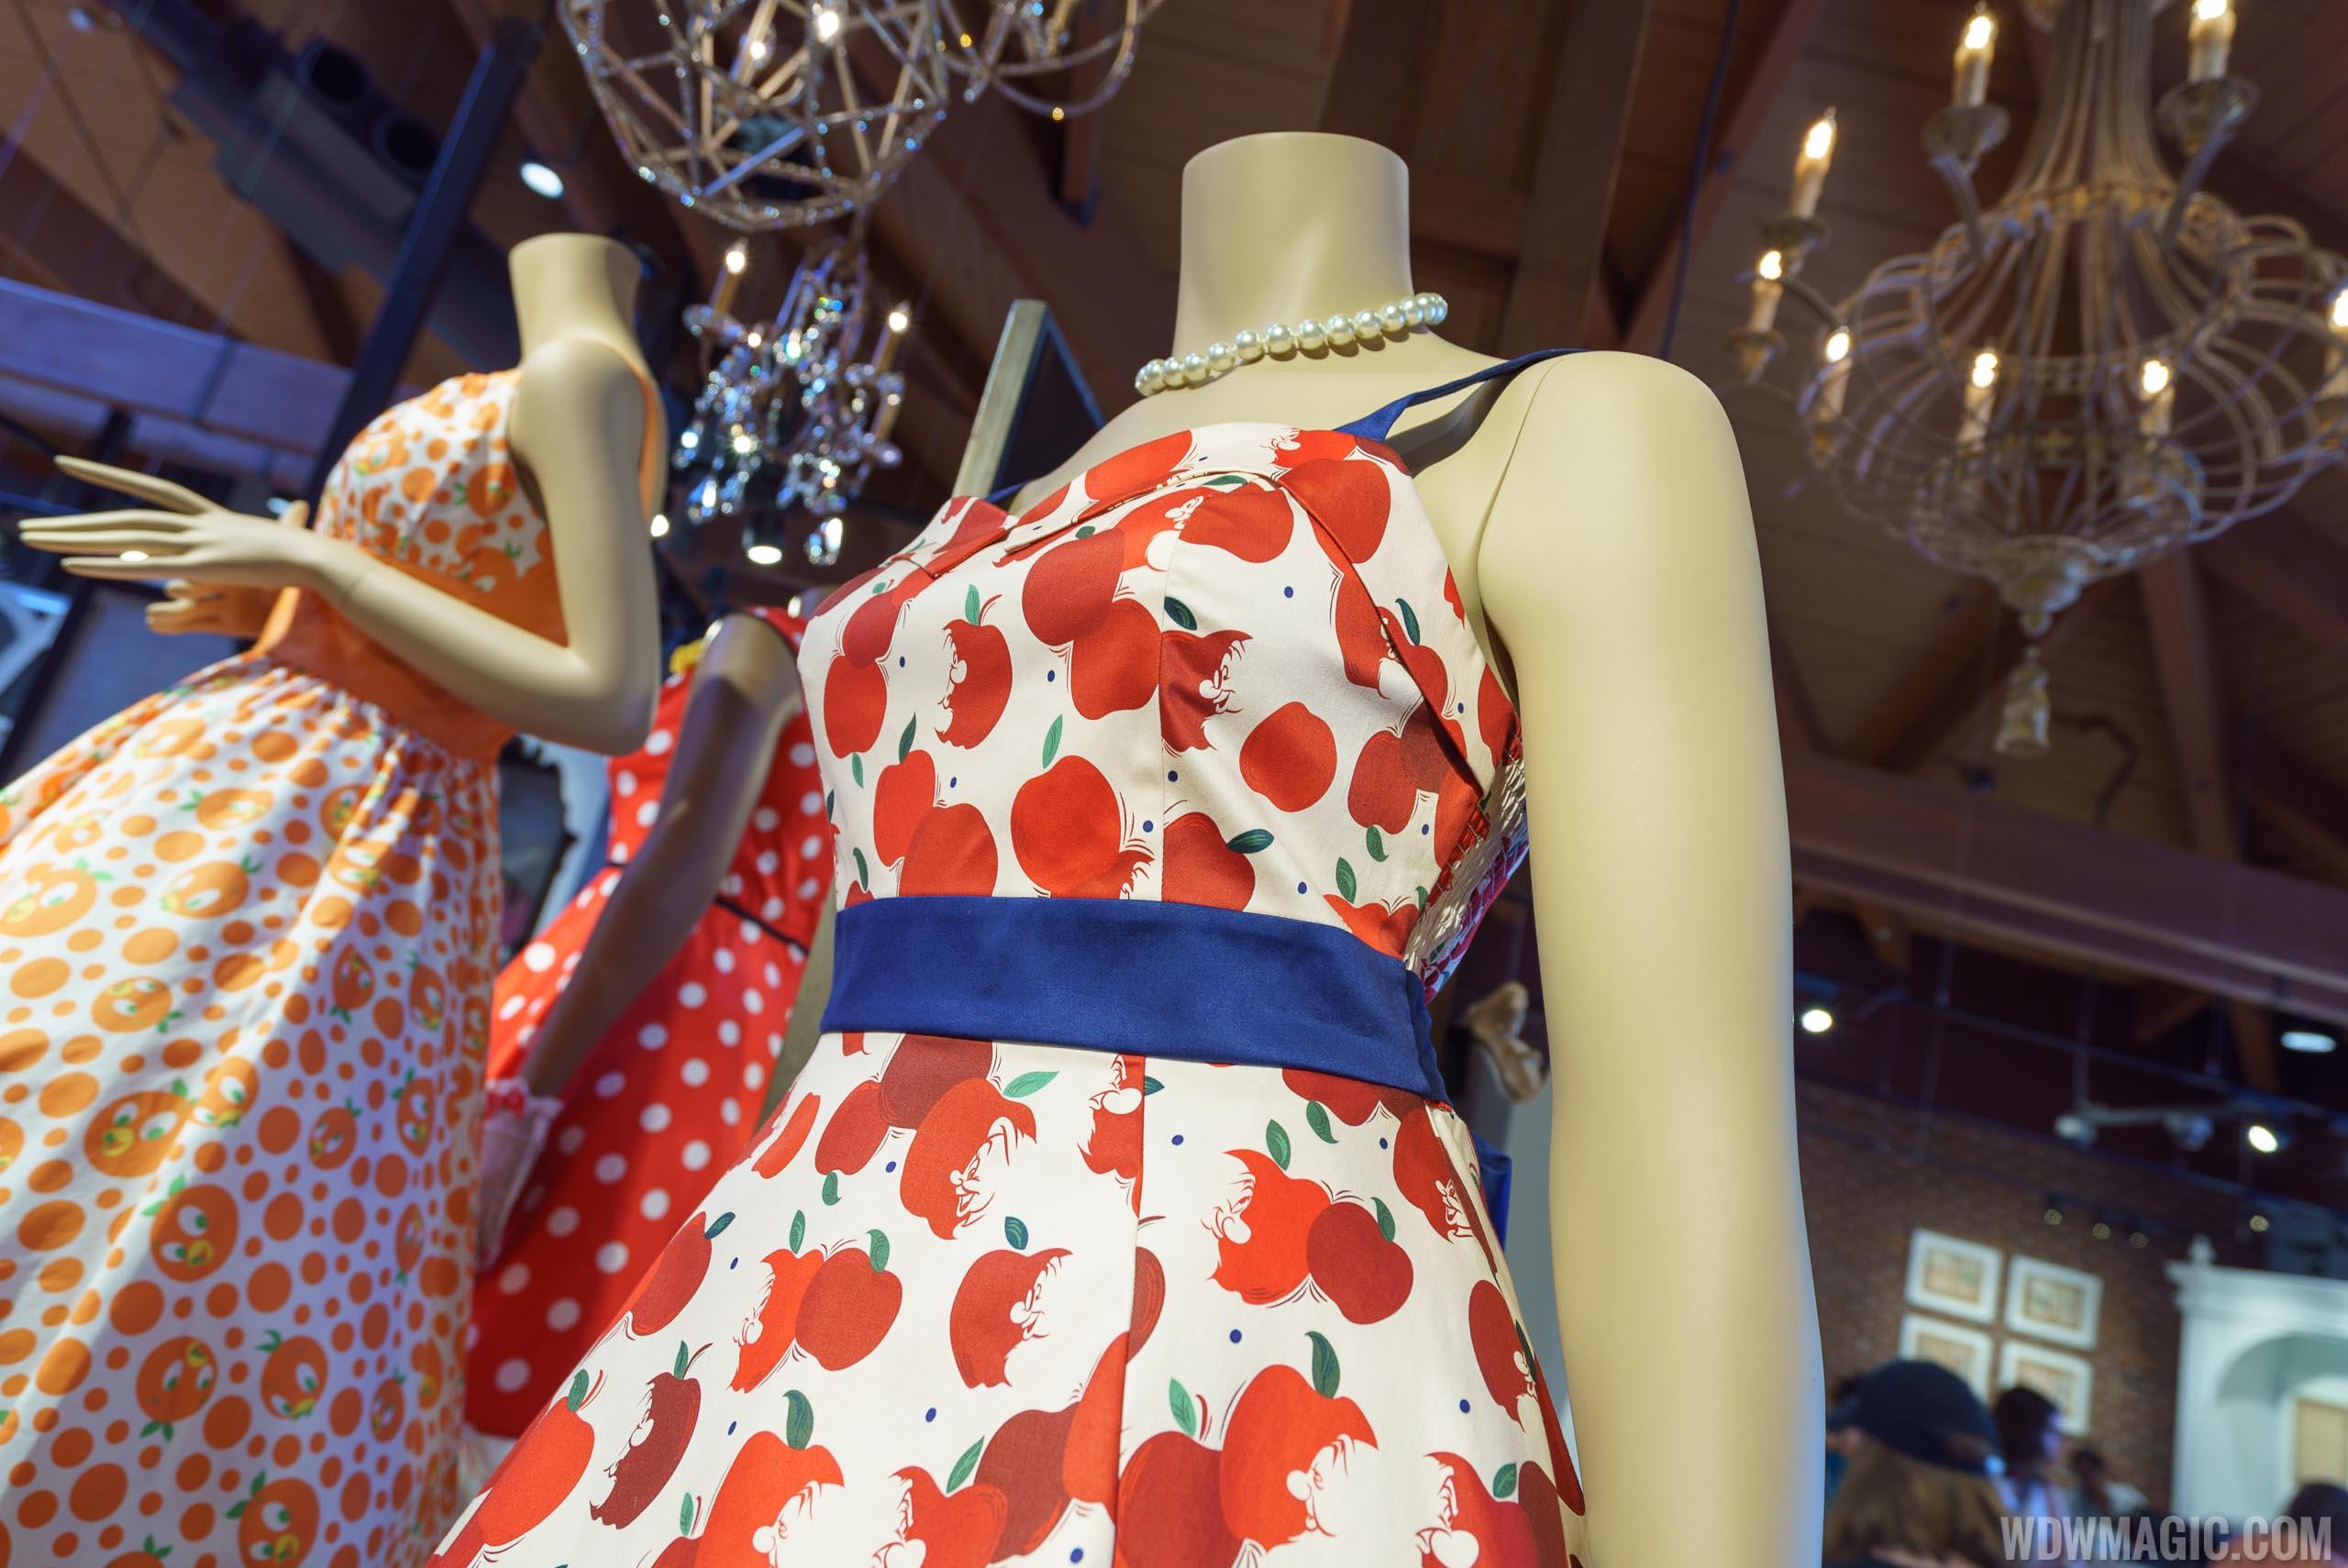 bf70cb68f8bdb PHOTOS - The Dress Shop on Cherry Tree Lane now open at Disney Springs